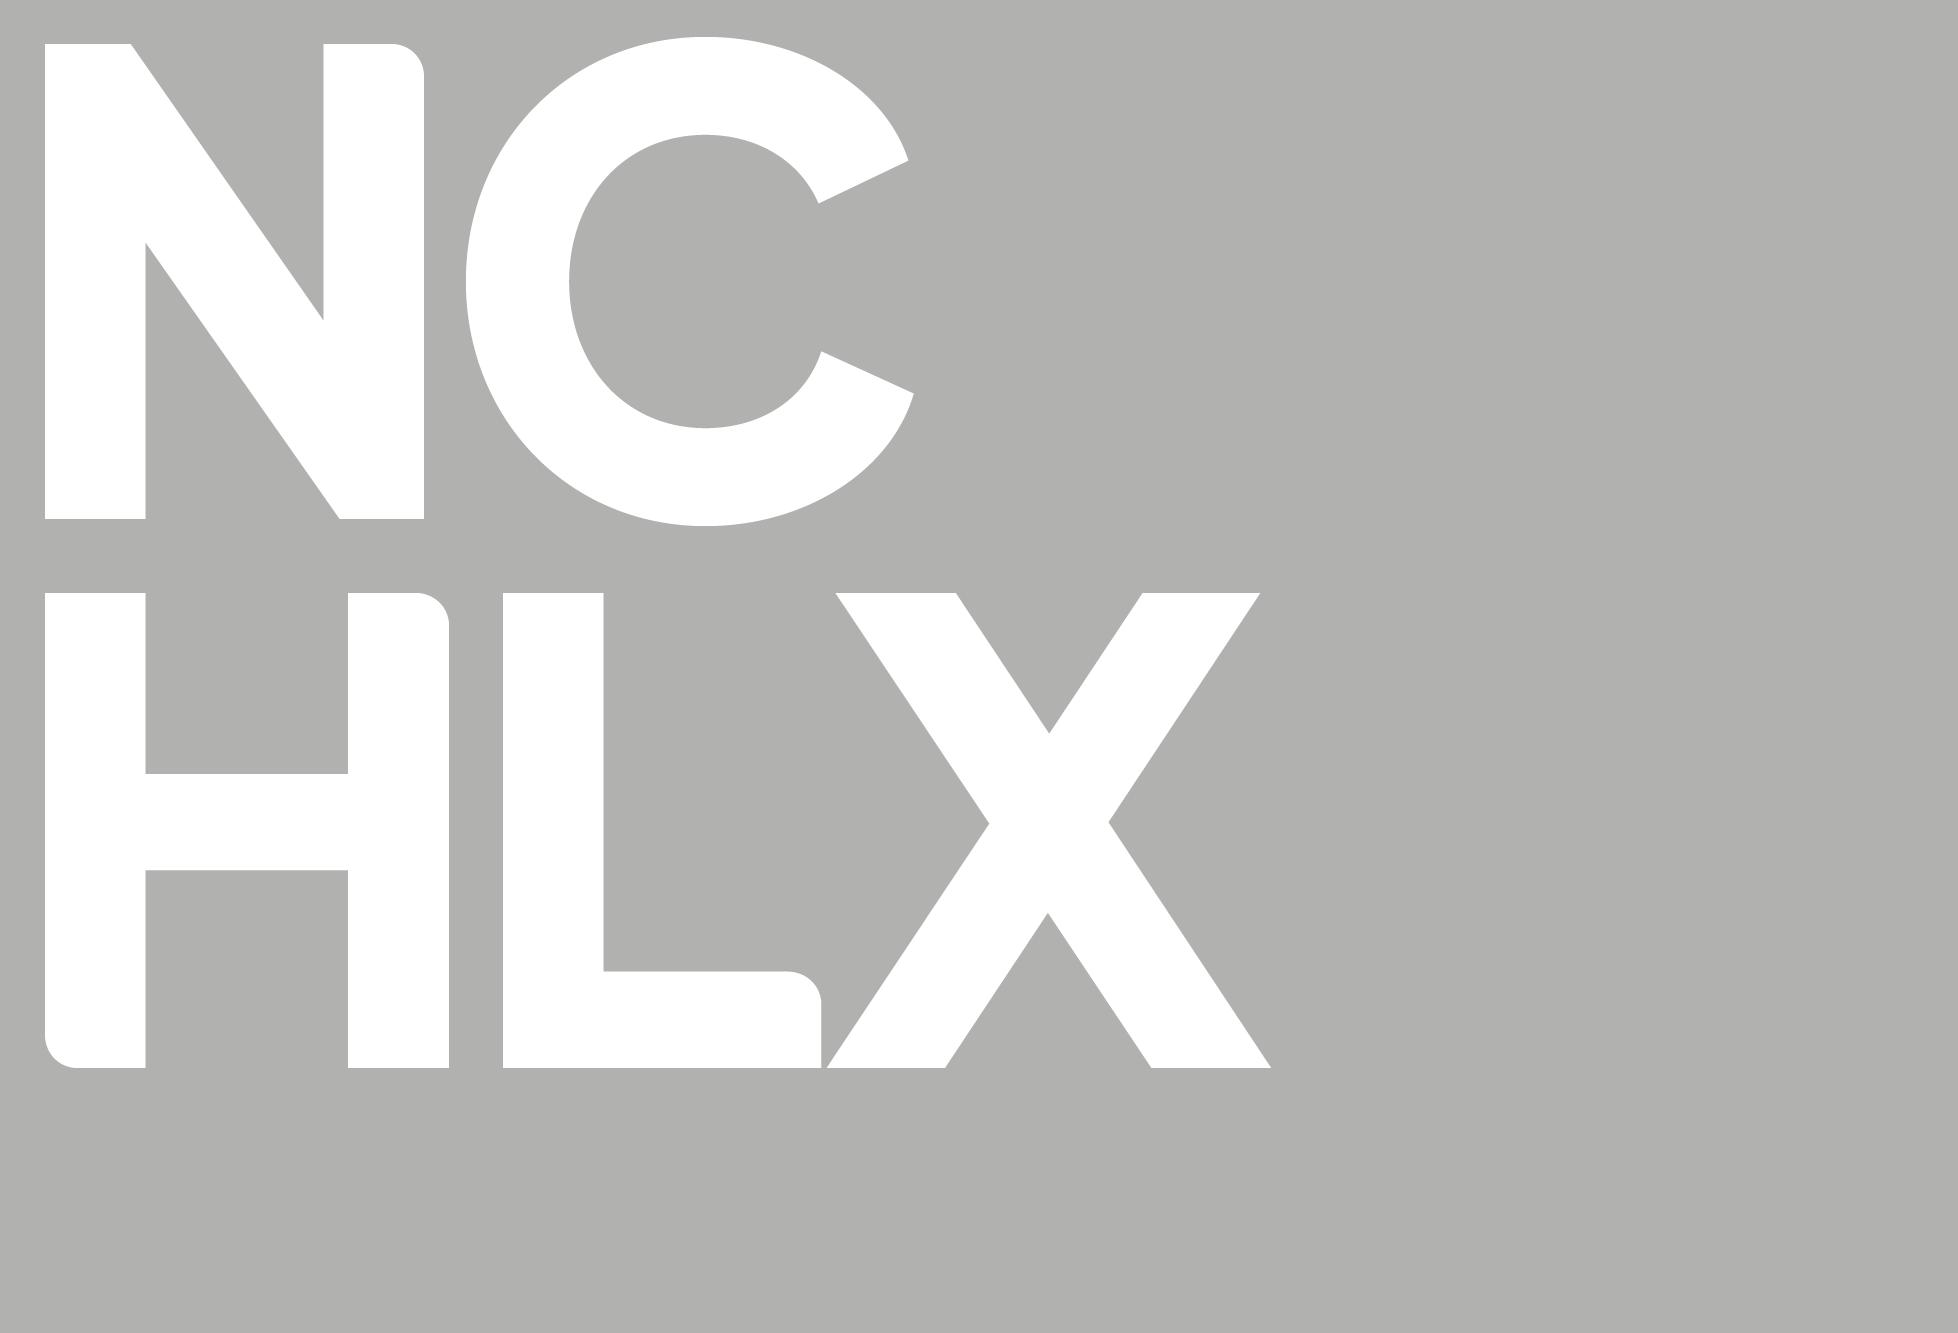 Hellix NC